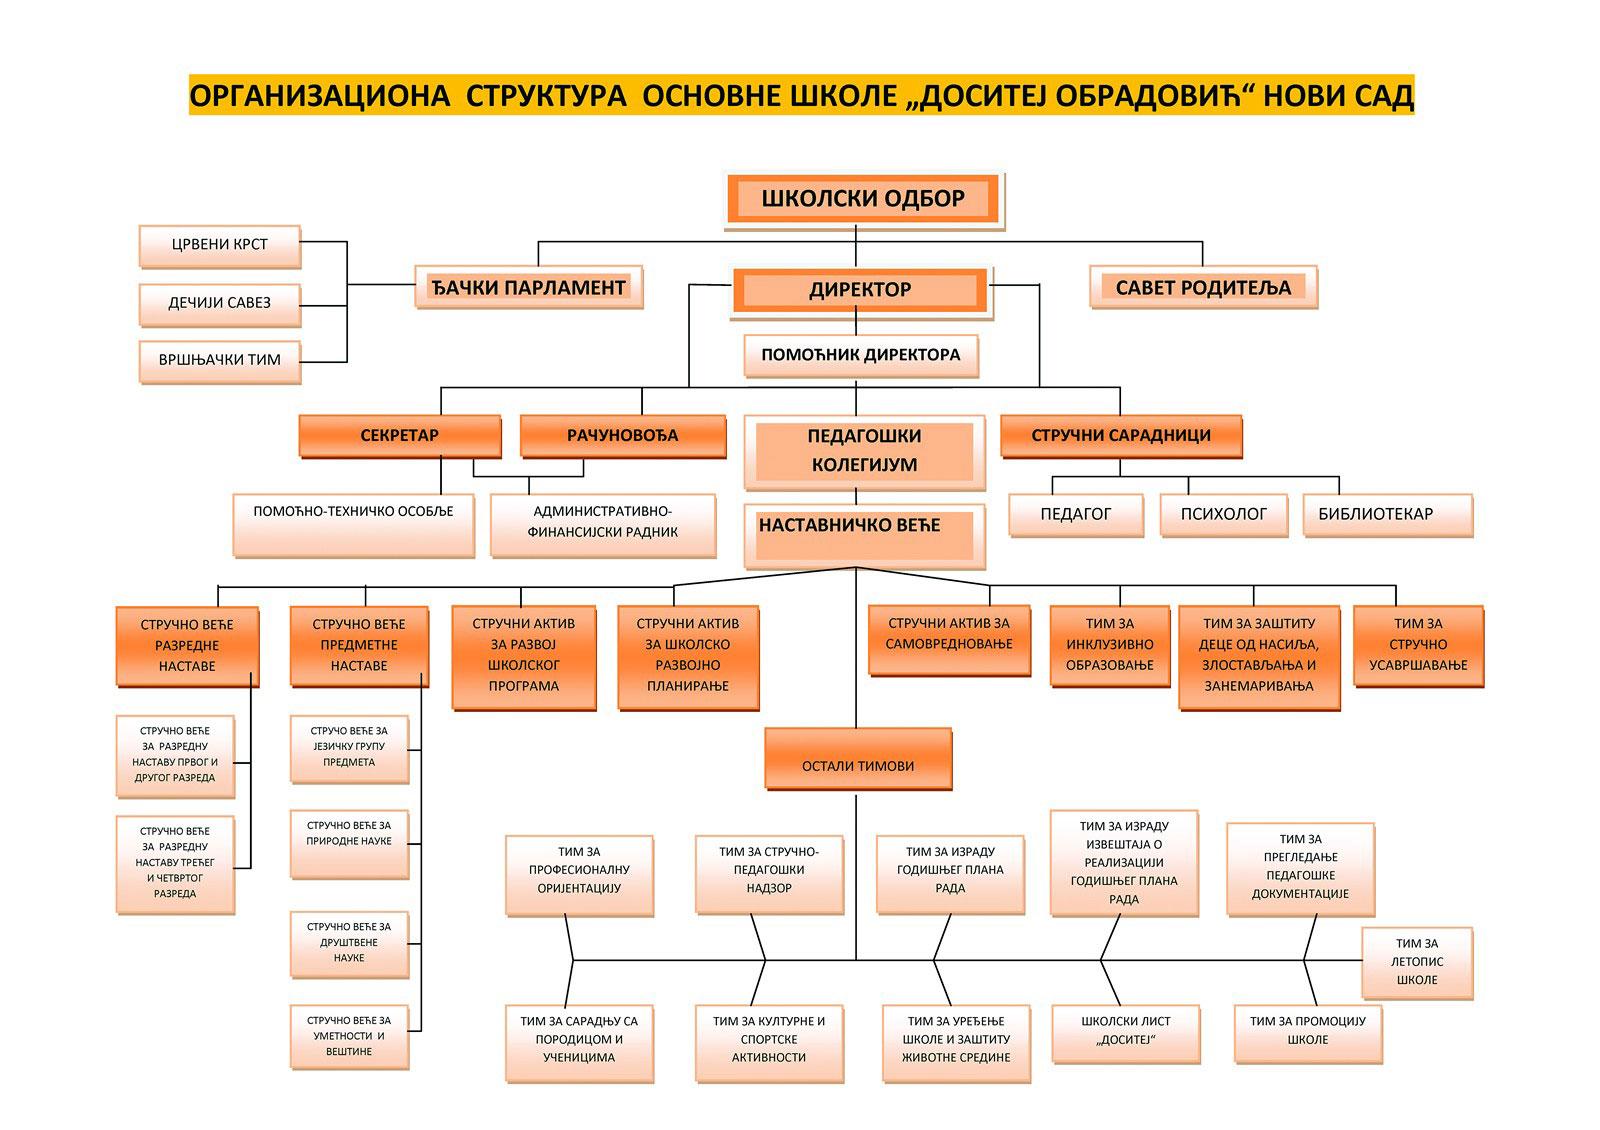 organizaciona struktura skole